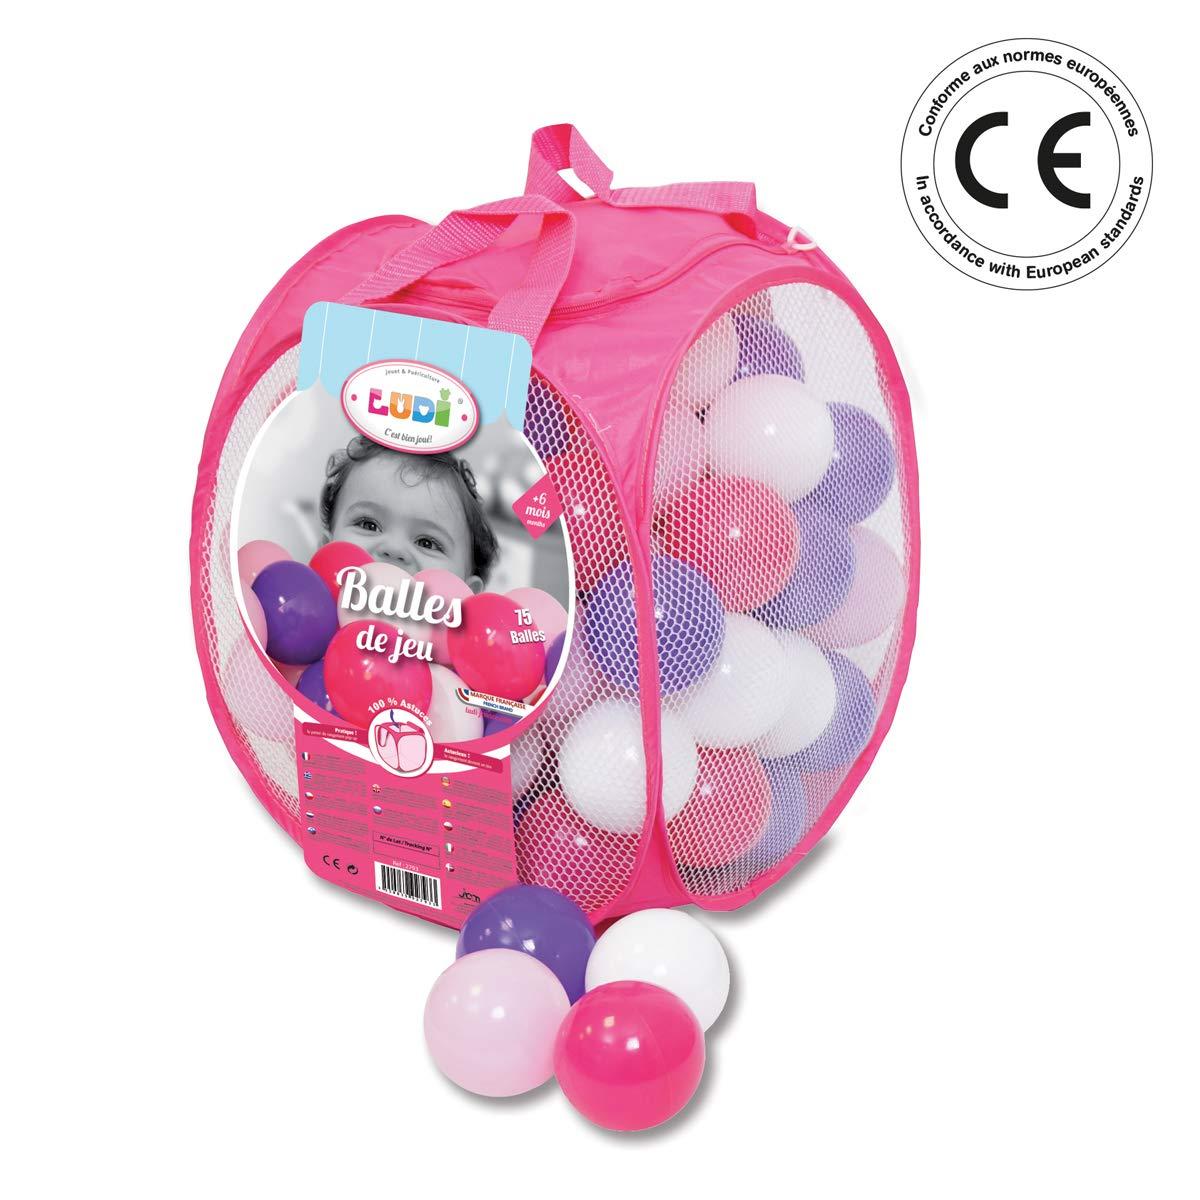 Ludi - Juguete para bebés product image